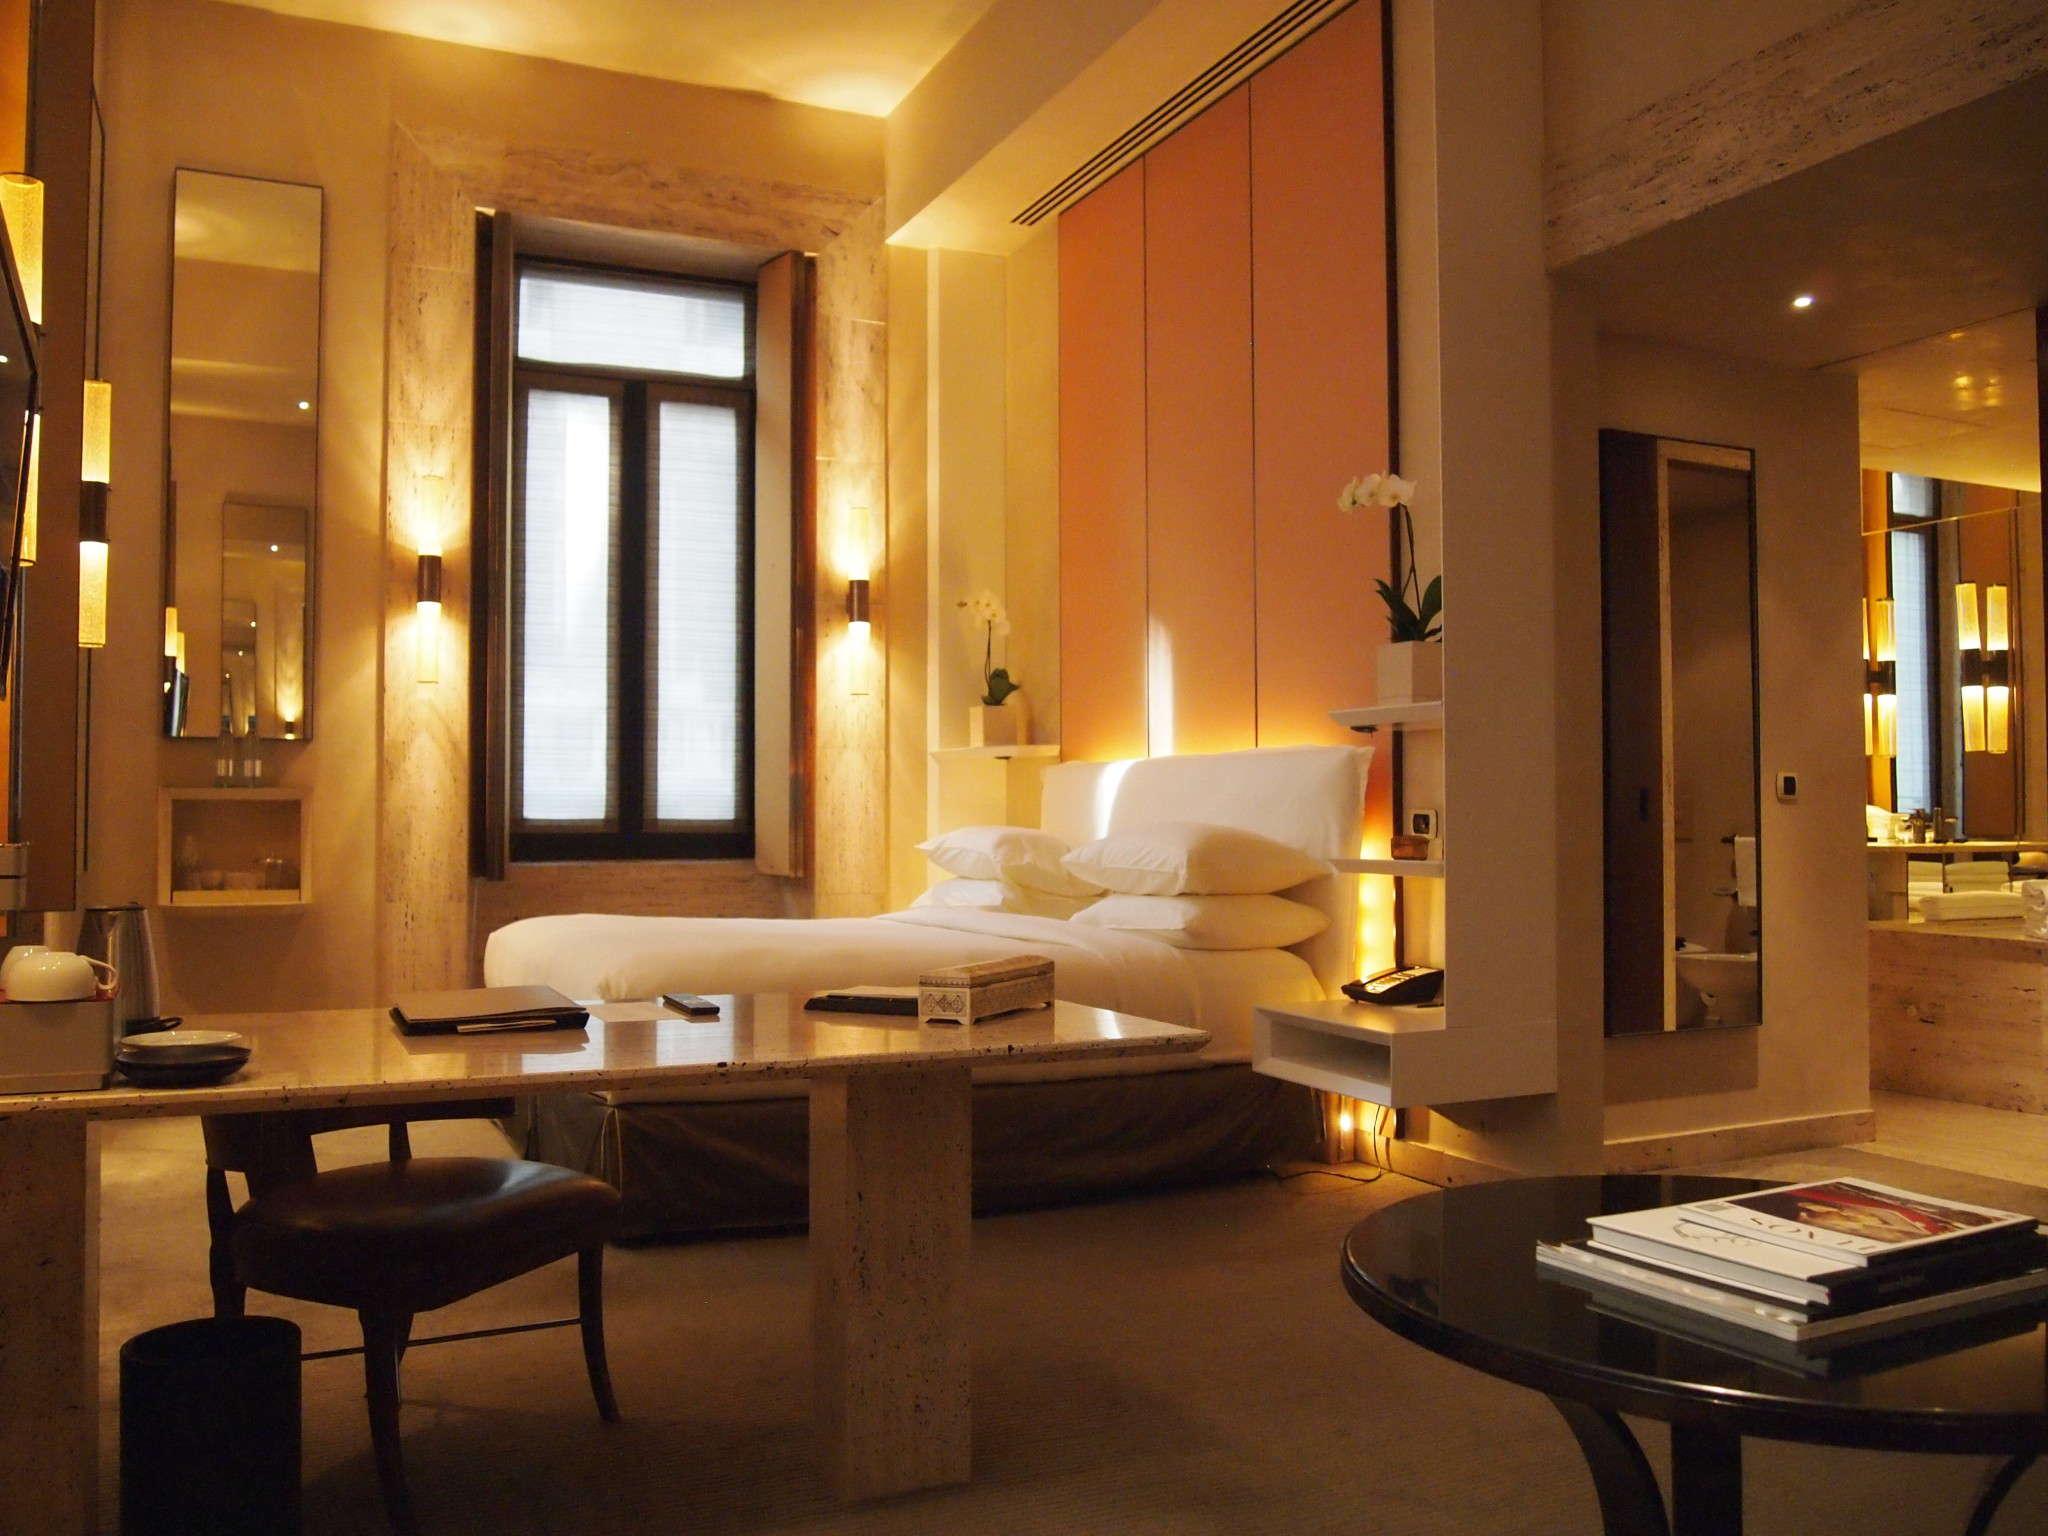 [Randy住宿紀錄] Park Hyatt Milan, Junior Suite 米蘭柏悅酒店小型套房